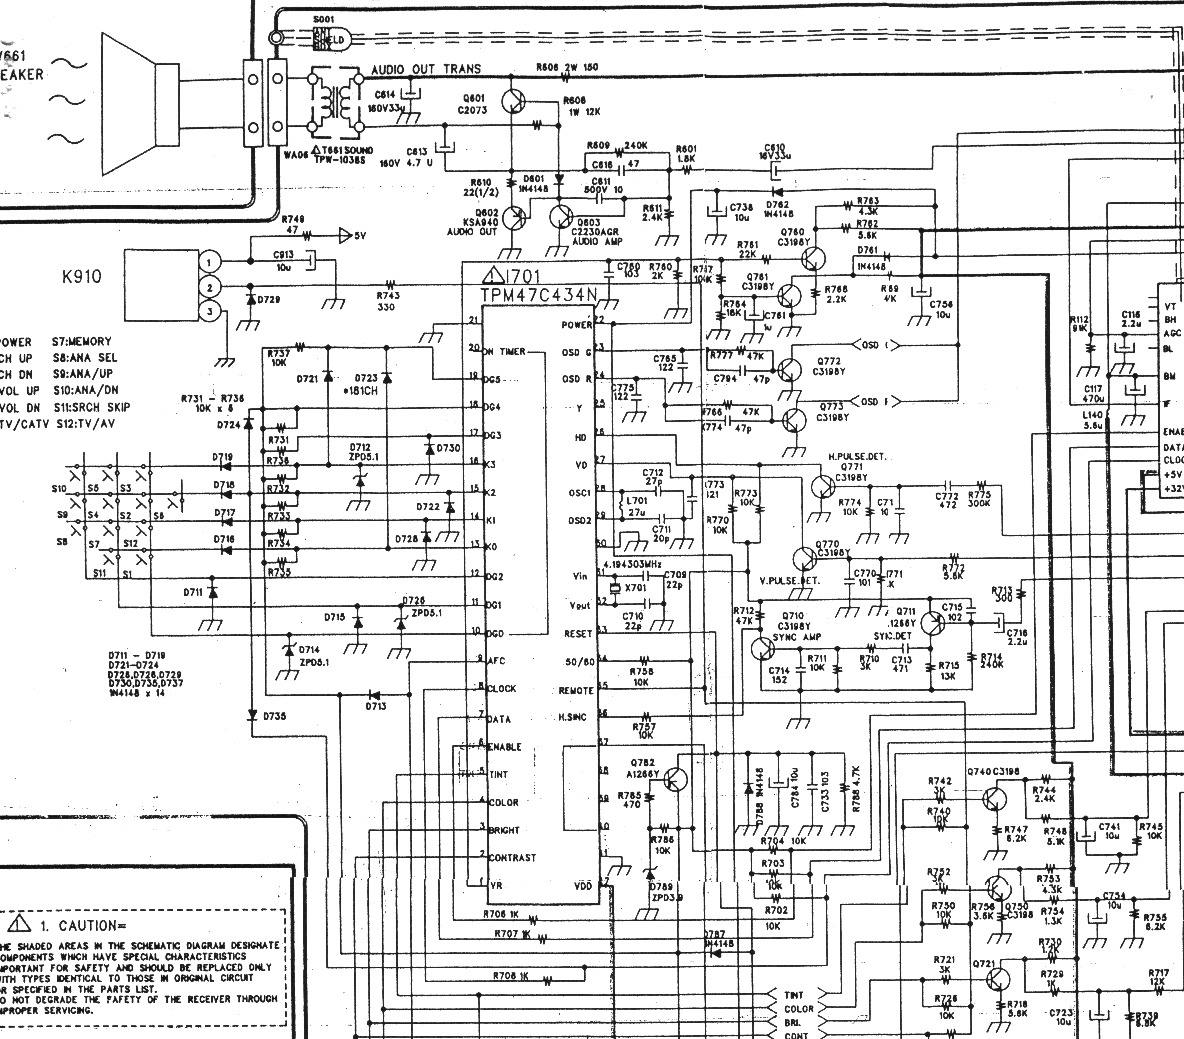 Daewoo DAEWOO CN52N pdf Diagramas de Televisores Lcd y